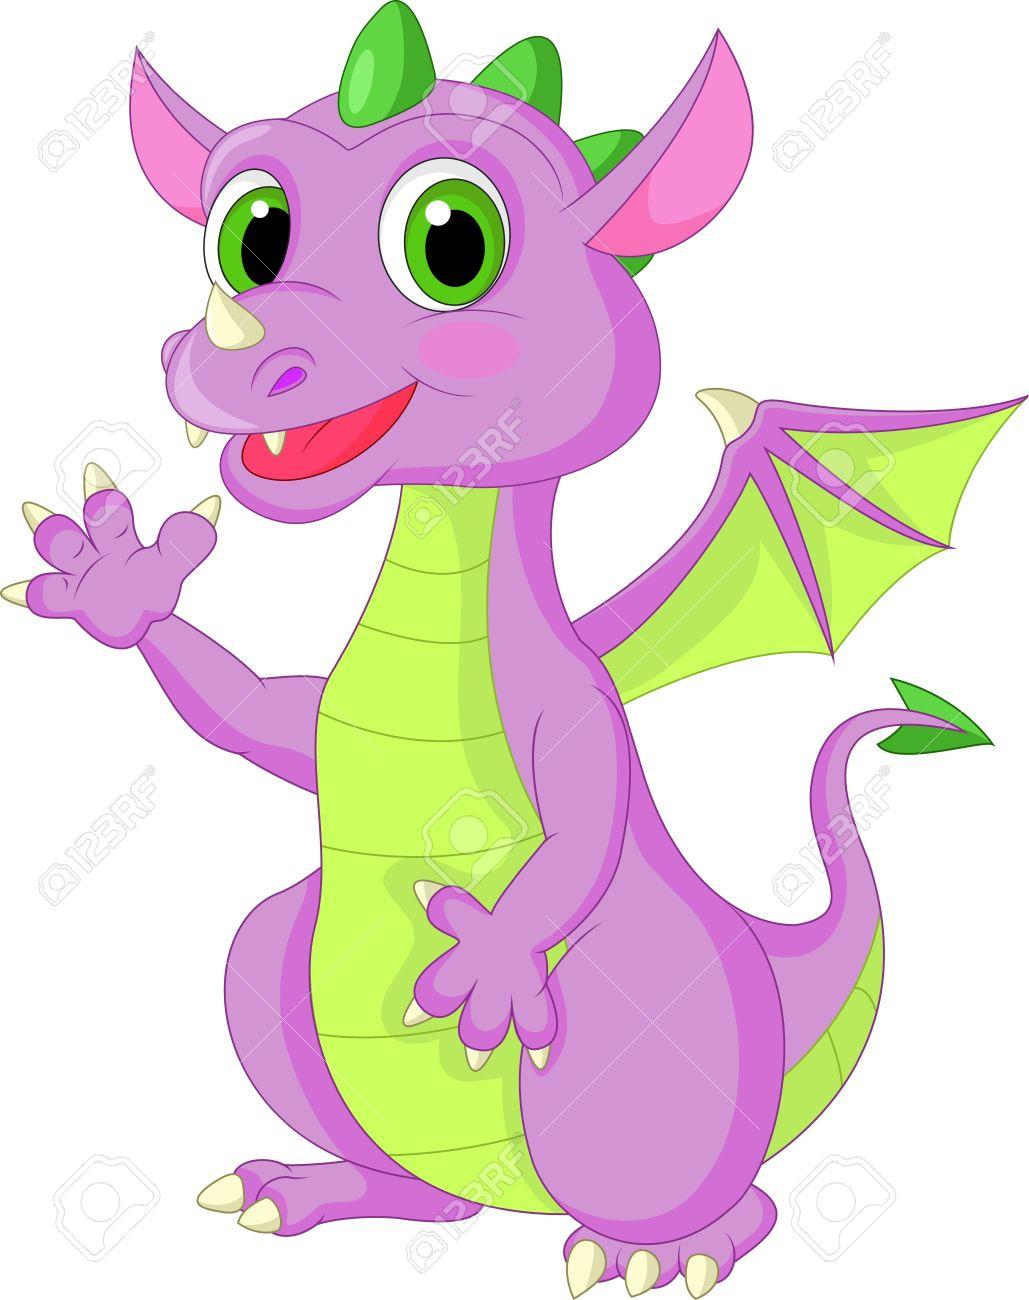 Cute baby dragon waving Stock Vector - 20219399